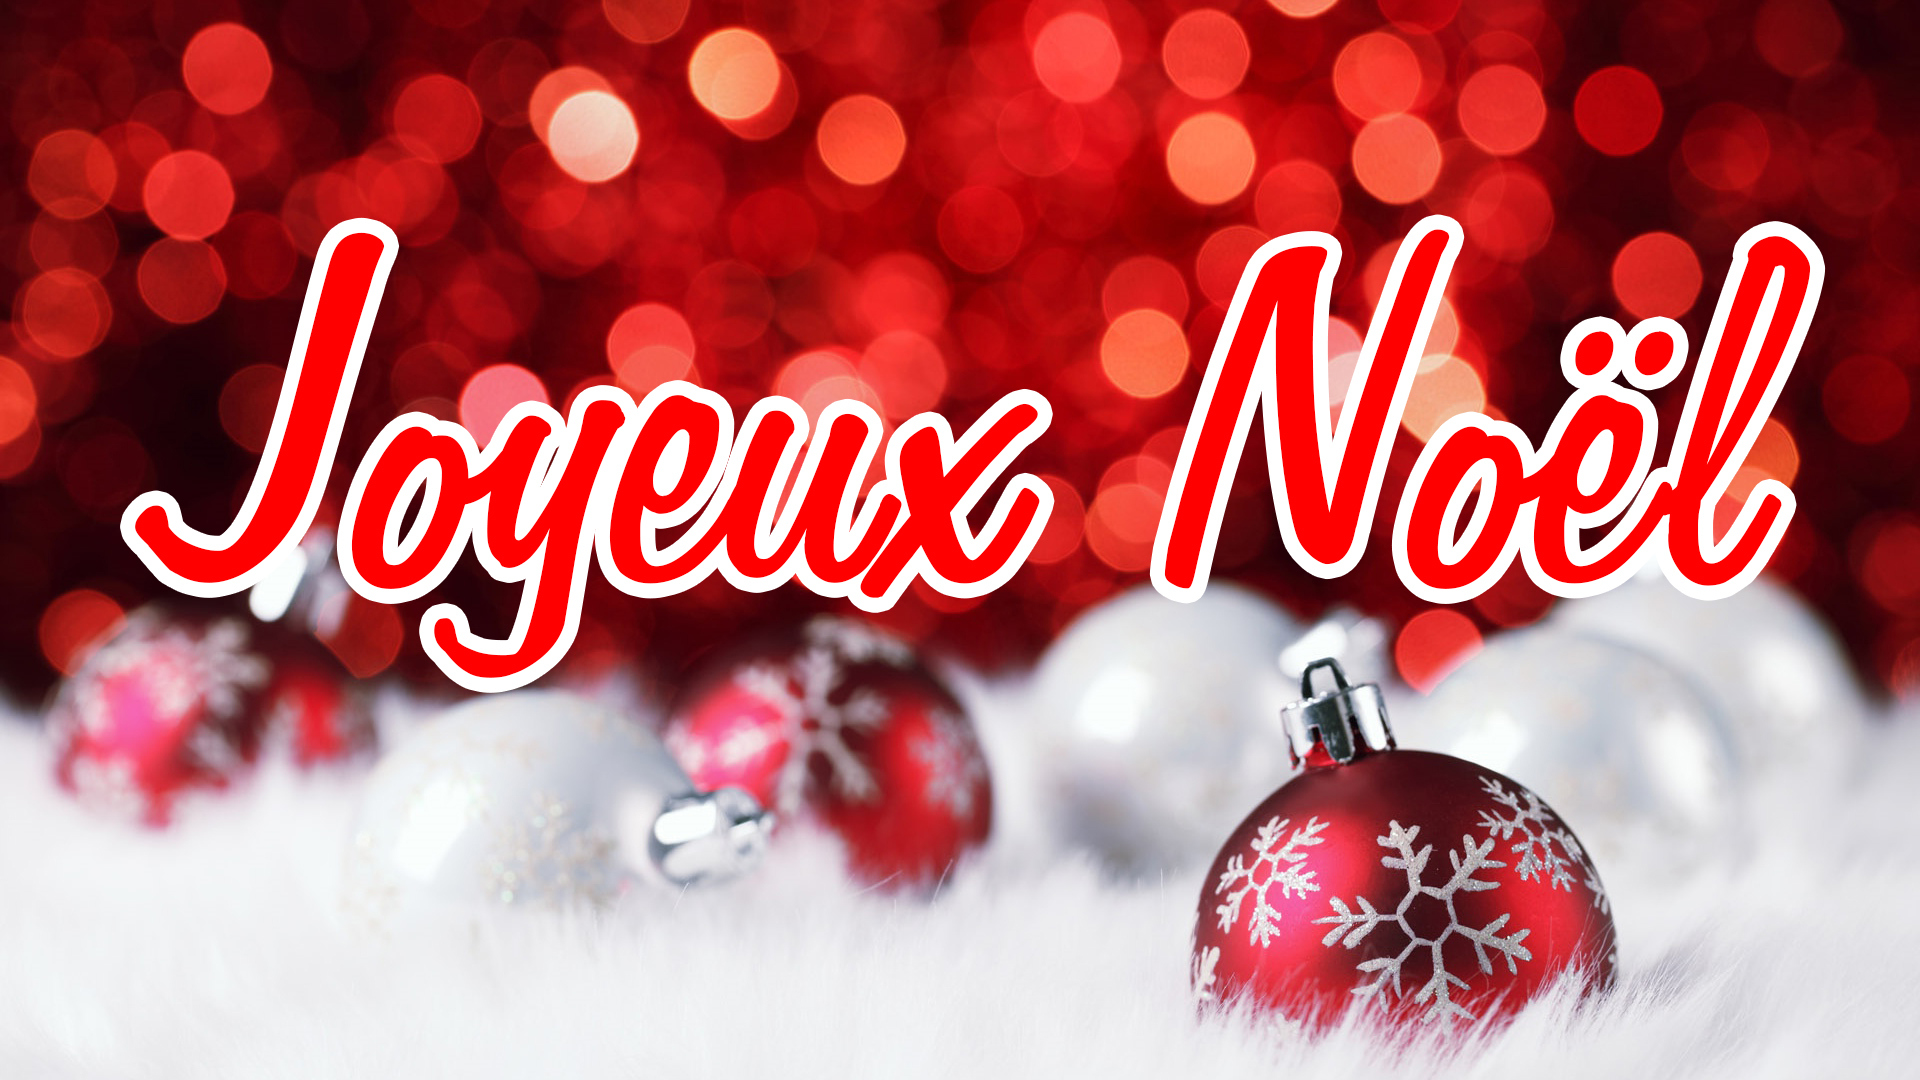 noel 2018 fond ecran Fonds D'écran Joyeux Noël   MaximumWallHD noel 2018 fond ecran